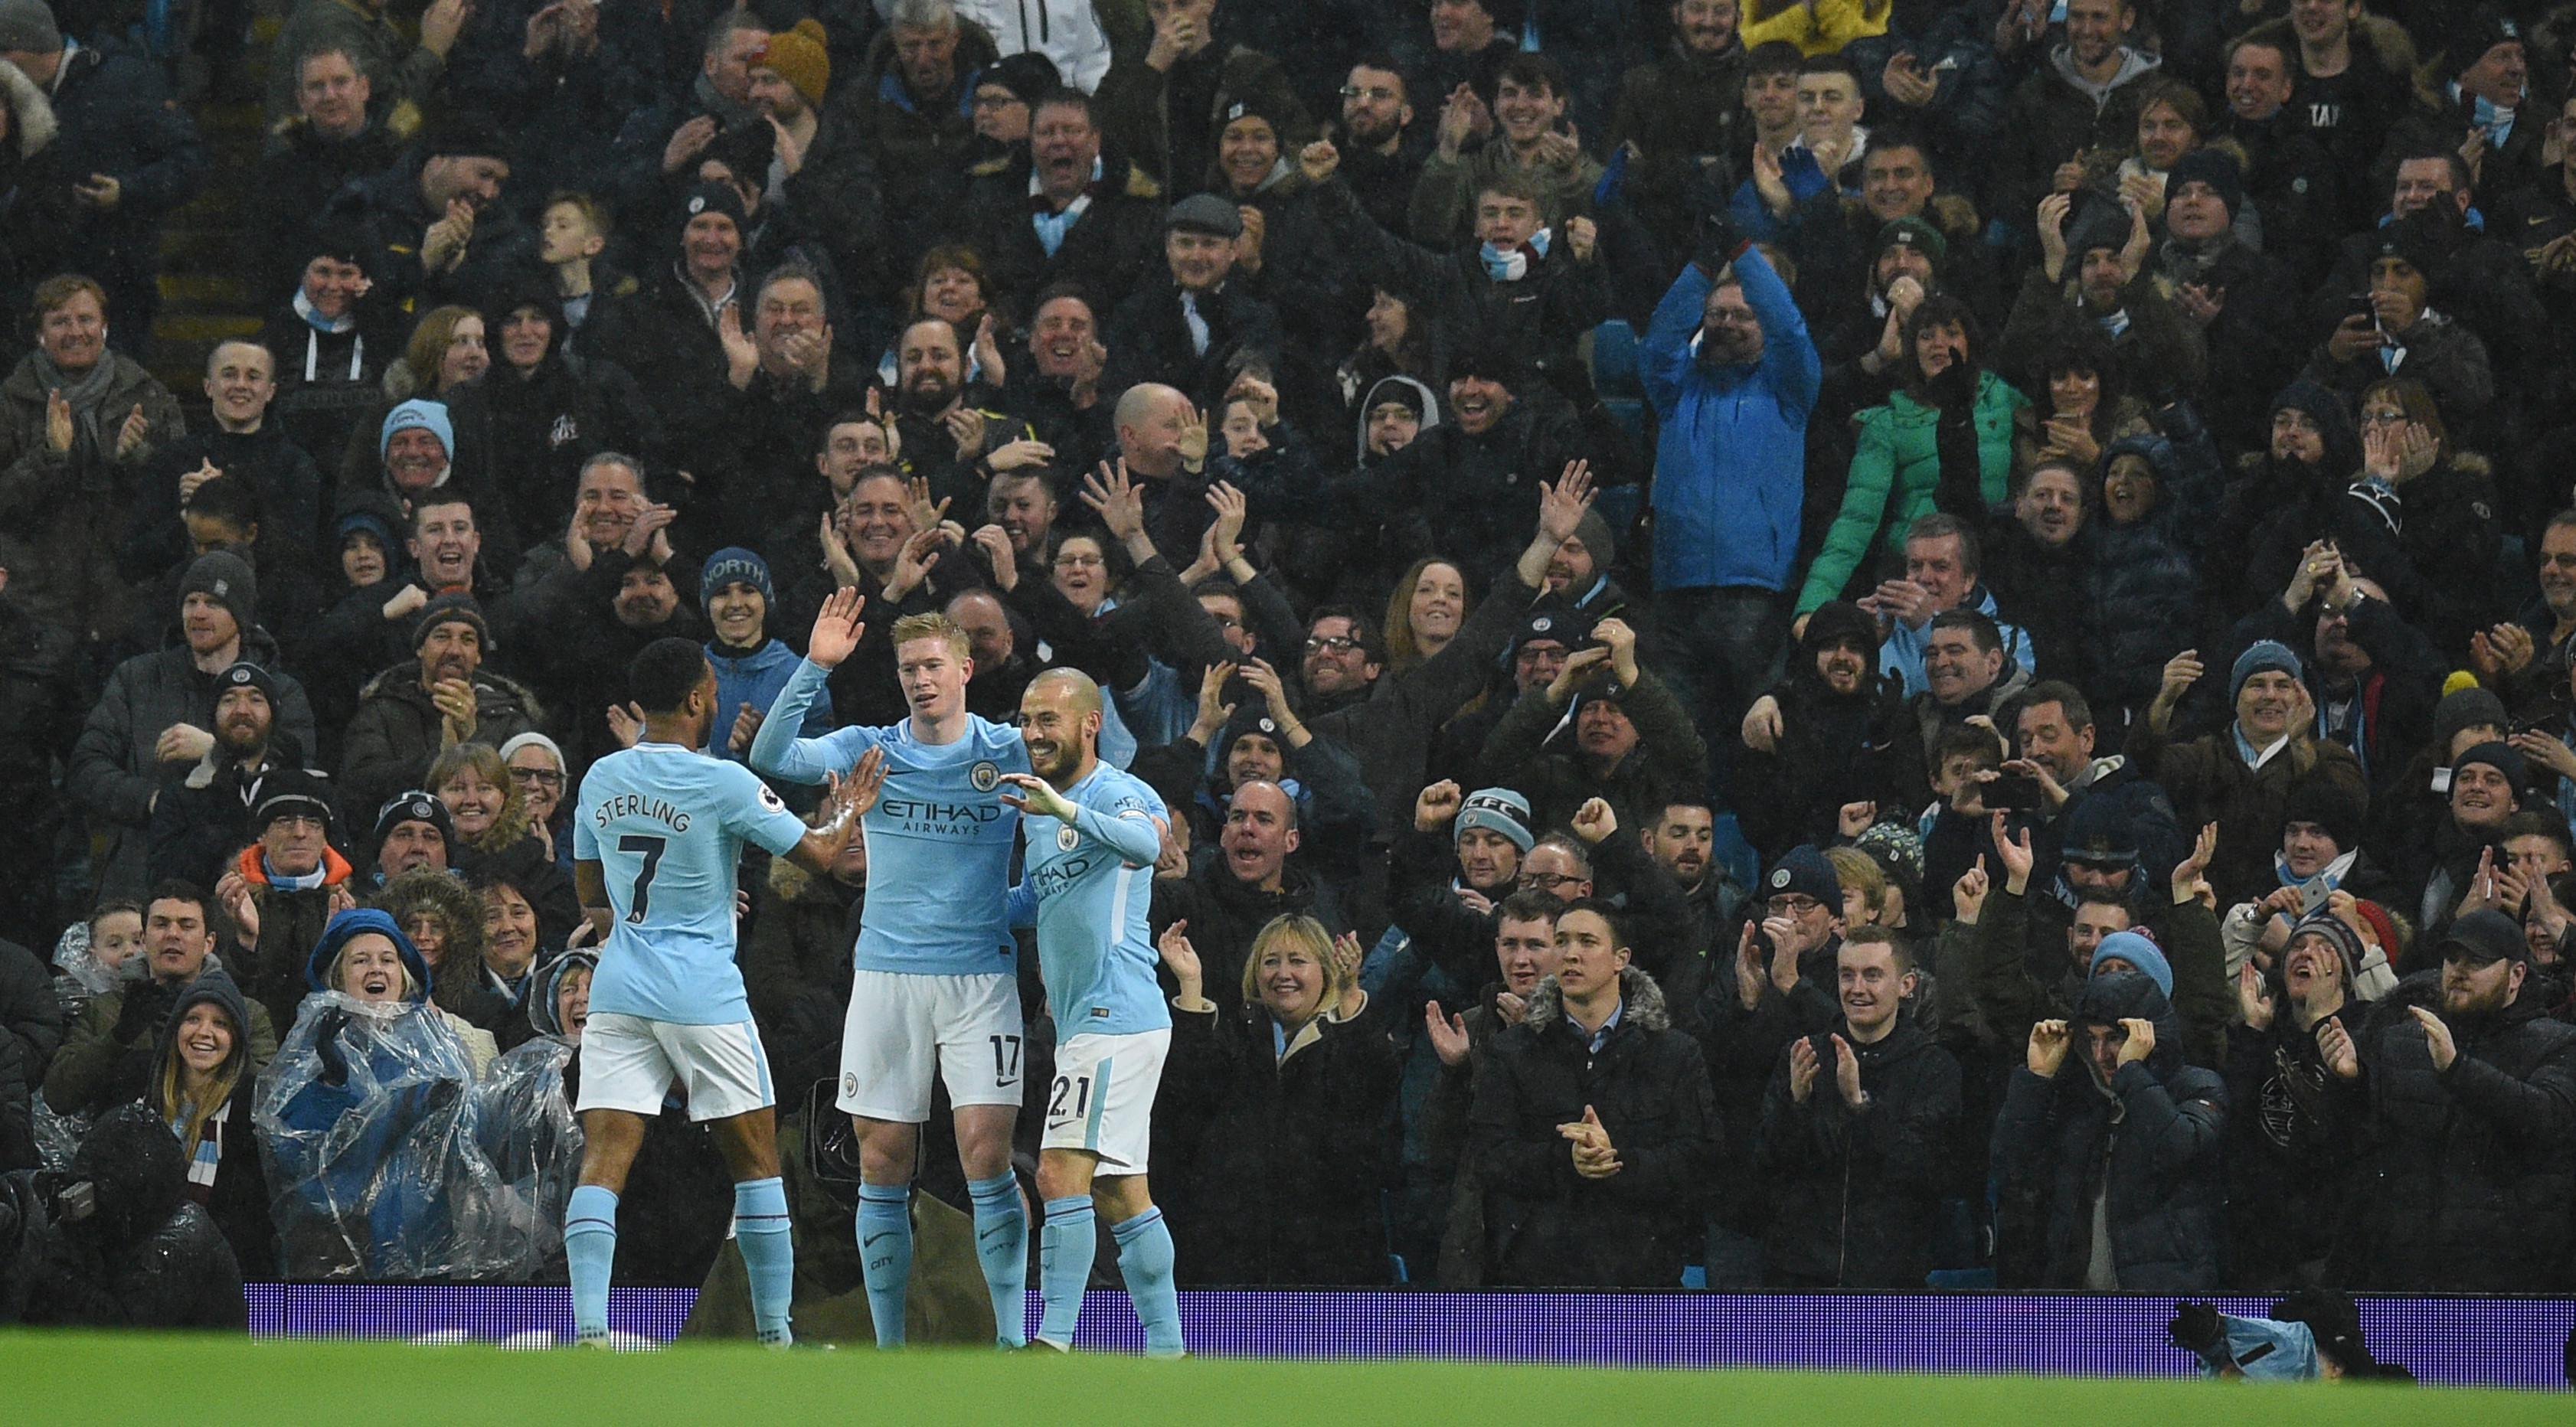 Pemain Manchester City, Kevin De Bruyne dan David Silva merayakan gol Raheem Sterling ke gawang Watford dalam lanjutan Premier League di Etihad Stadium, Selasa (2/1). Manchester City mengatasi perlawanan Watford dengan skor 3-1. (Oli SCARFF/AFP)